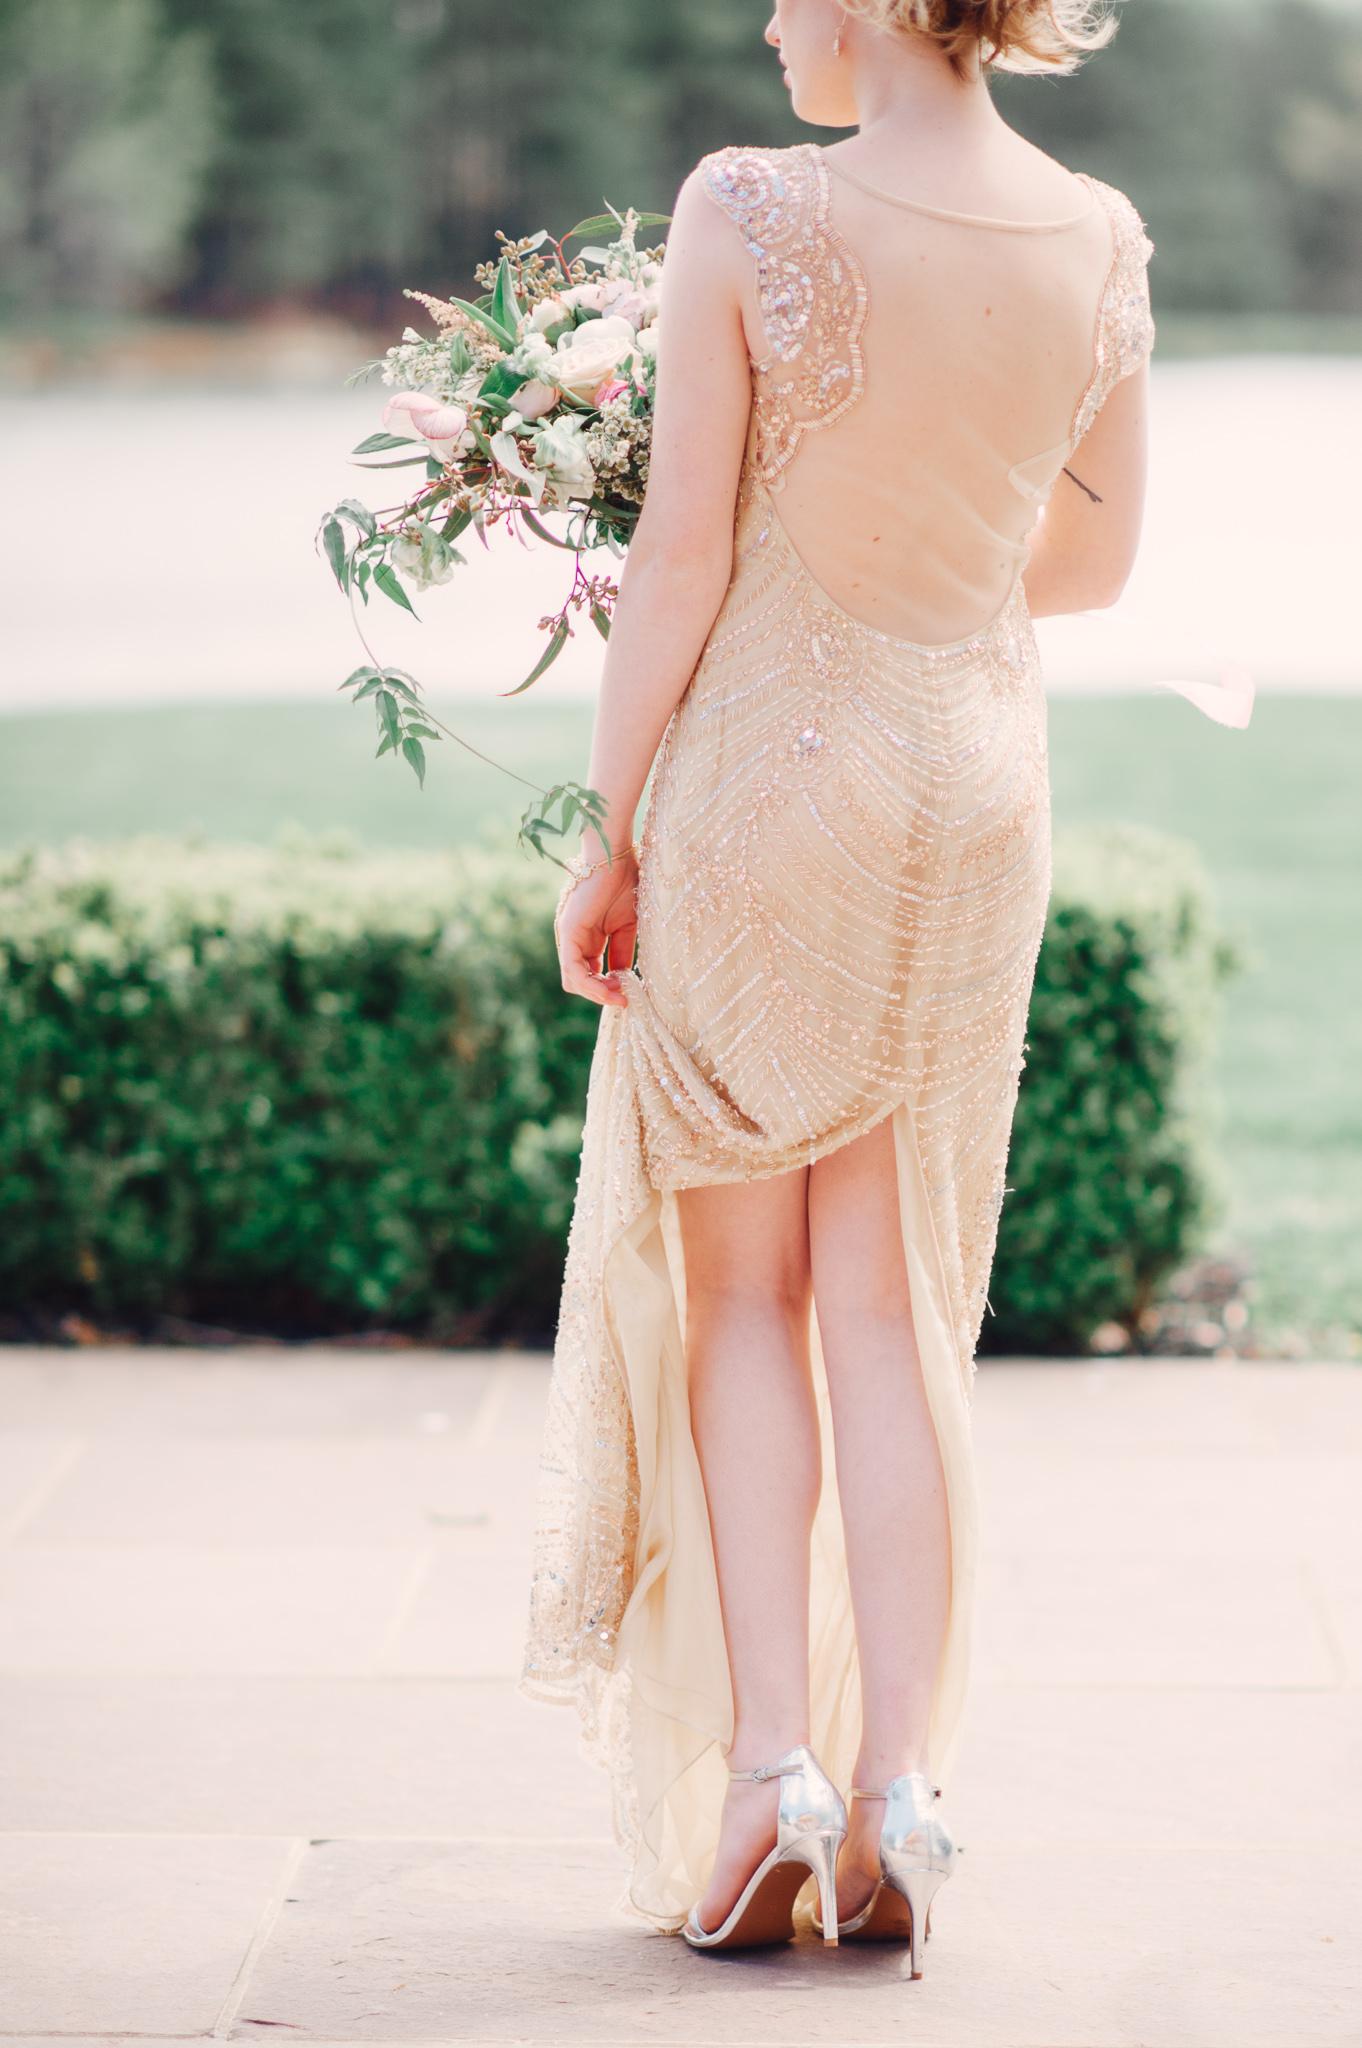 virginiawedding_bridalphotos_charlottesvillewedding_youseephotography_TrumpWinery (32).jpg